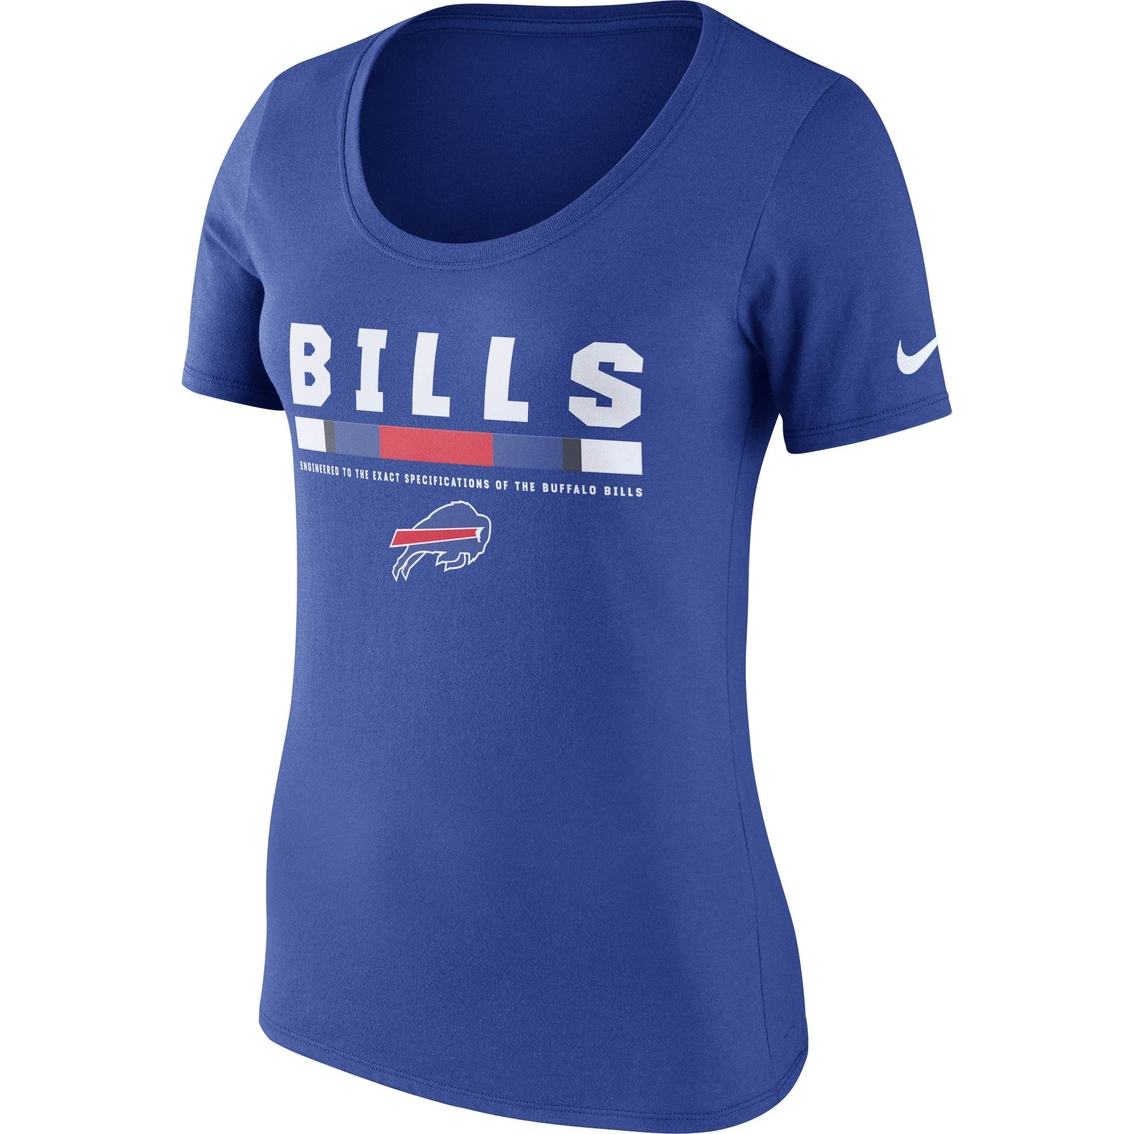 3141e357b72d0 Nike Nfl Buffalo Bills Women s Team Scoop Tee